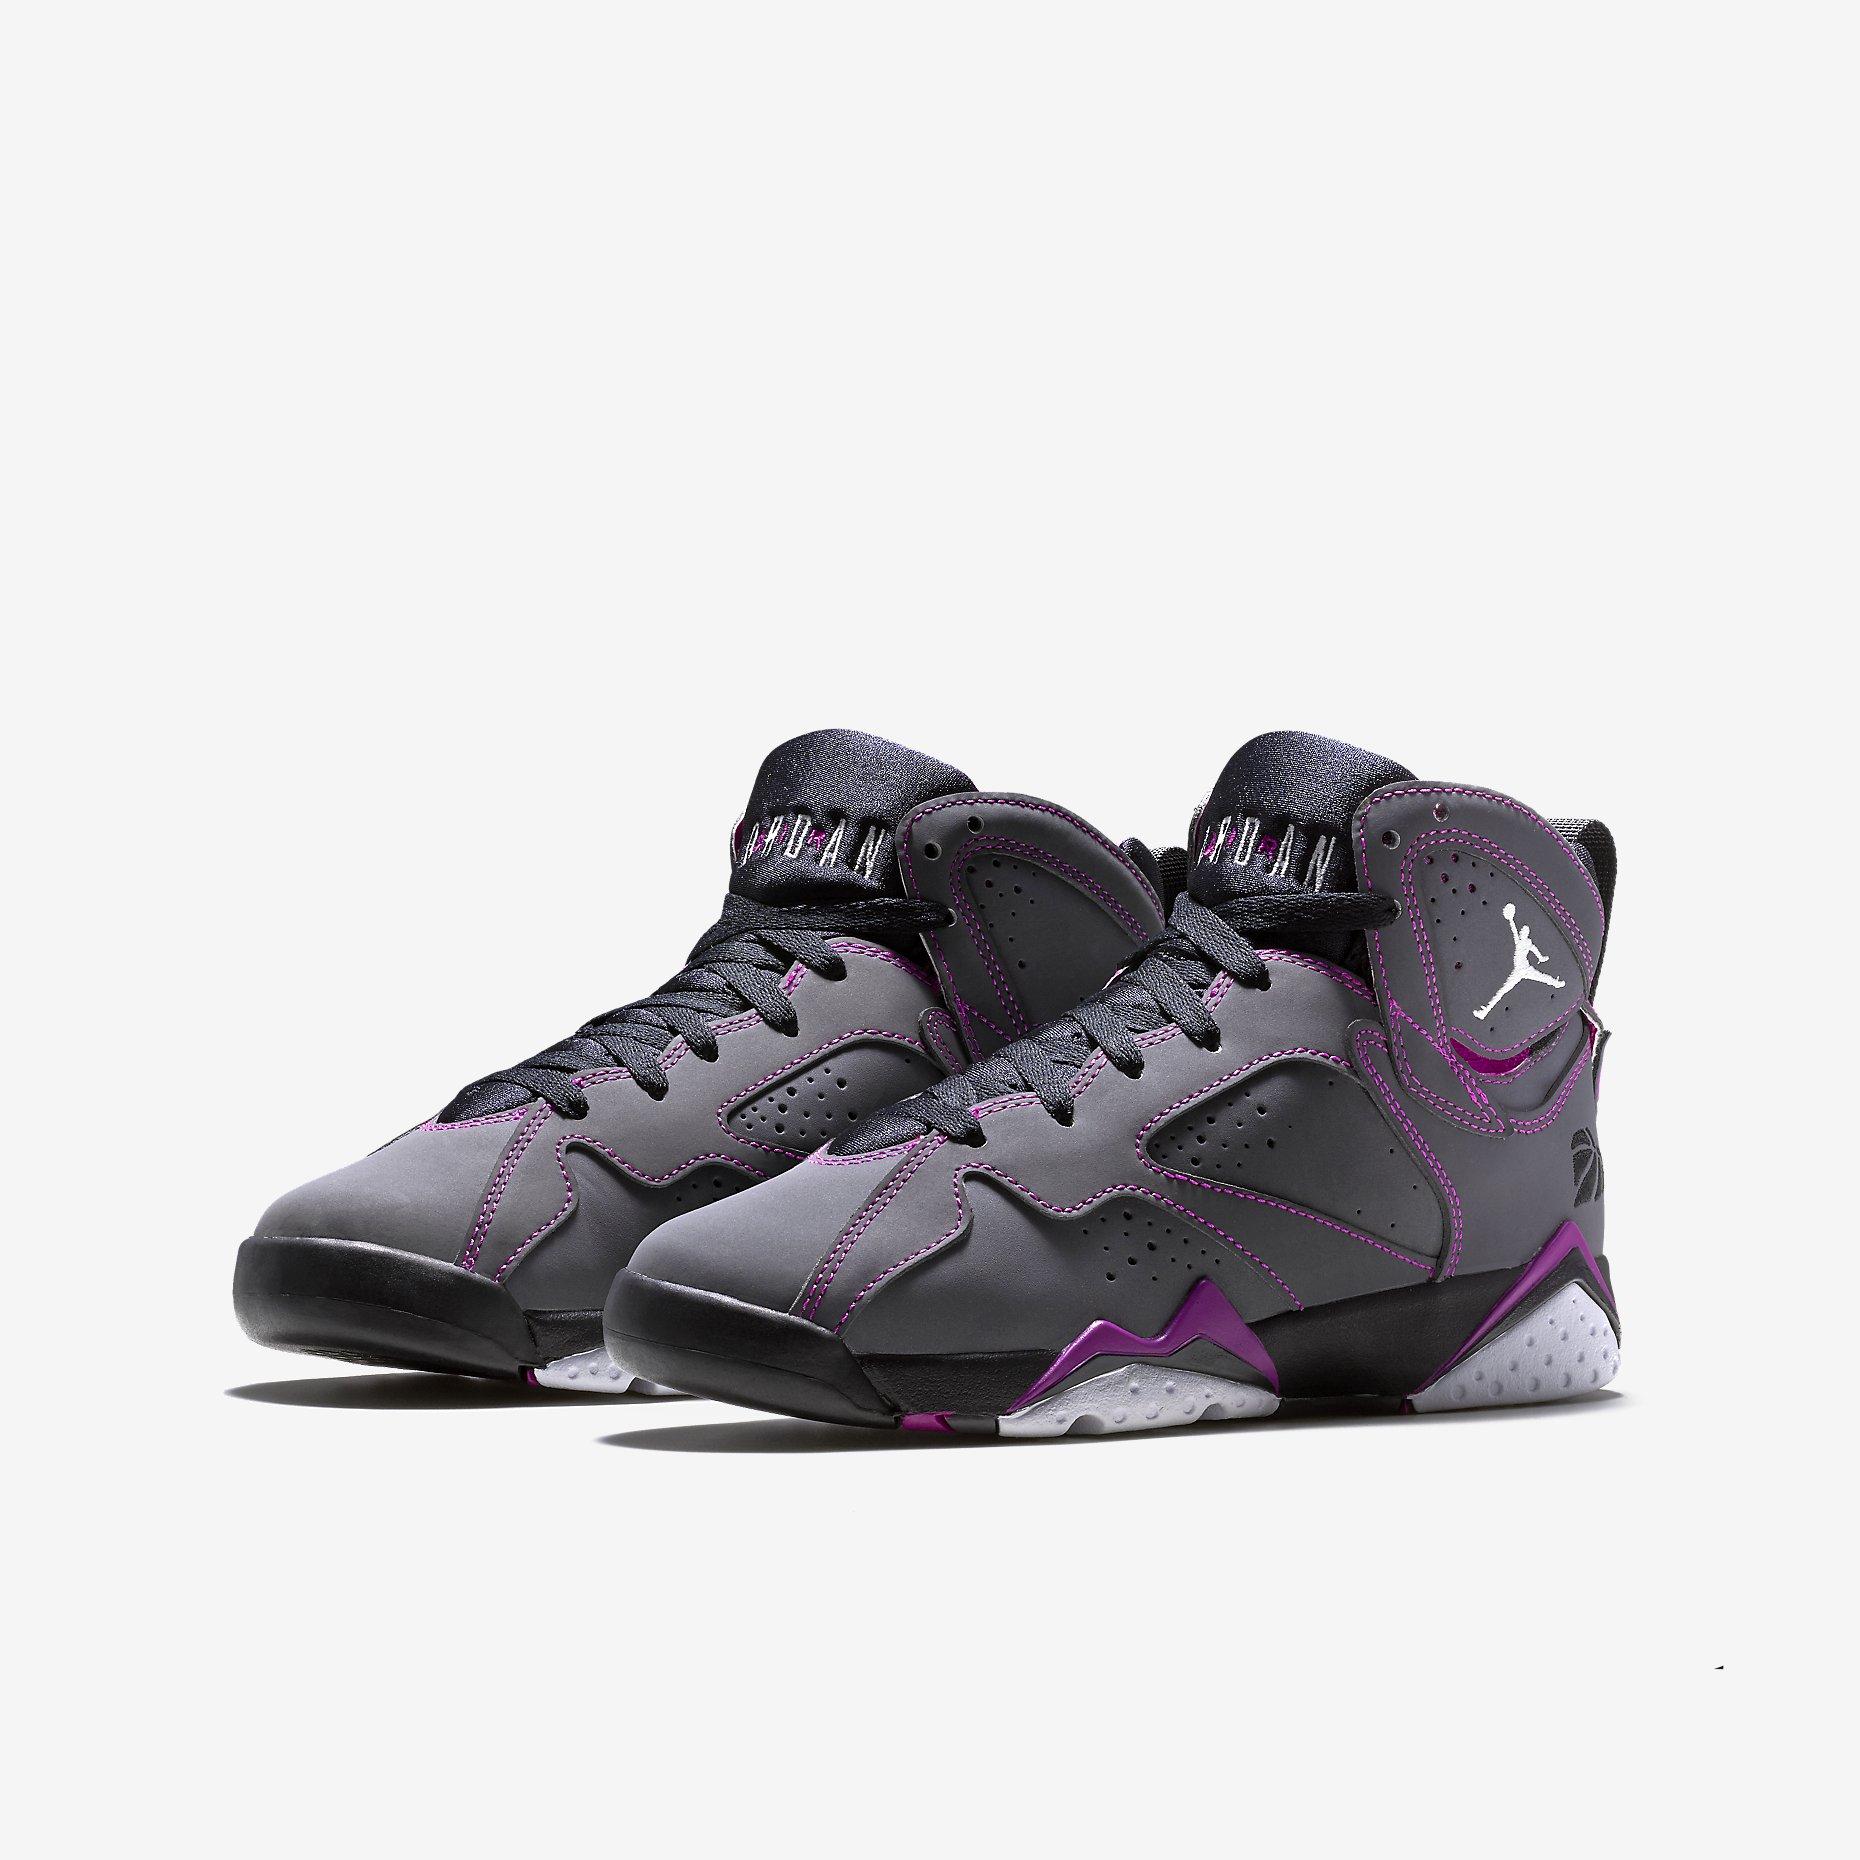 best loved b59eb f1de7 Air Jordan 7 Retro 30th. Color  Dark Grey Black-Fuchsia Flash-White Style   705417-016. Release  02 07 2015. Price   140.00